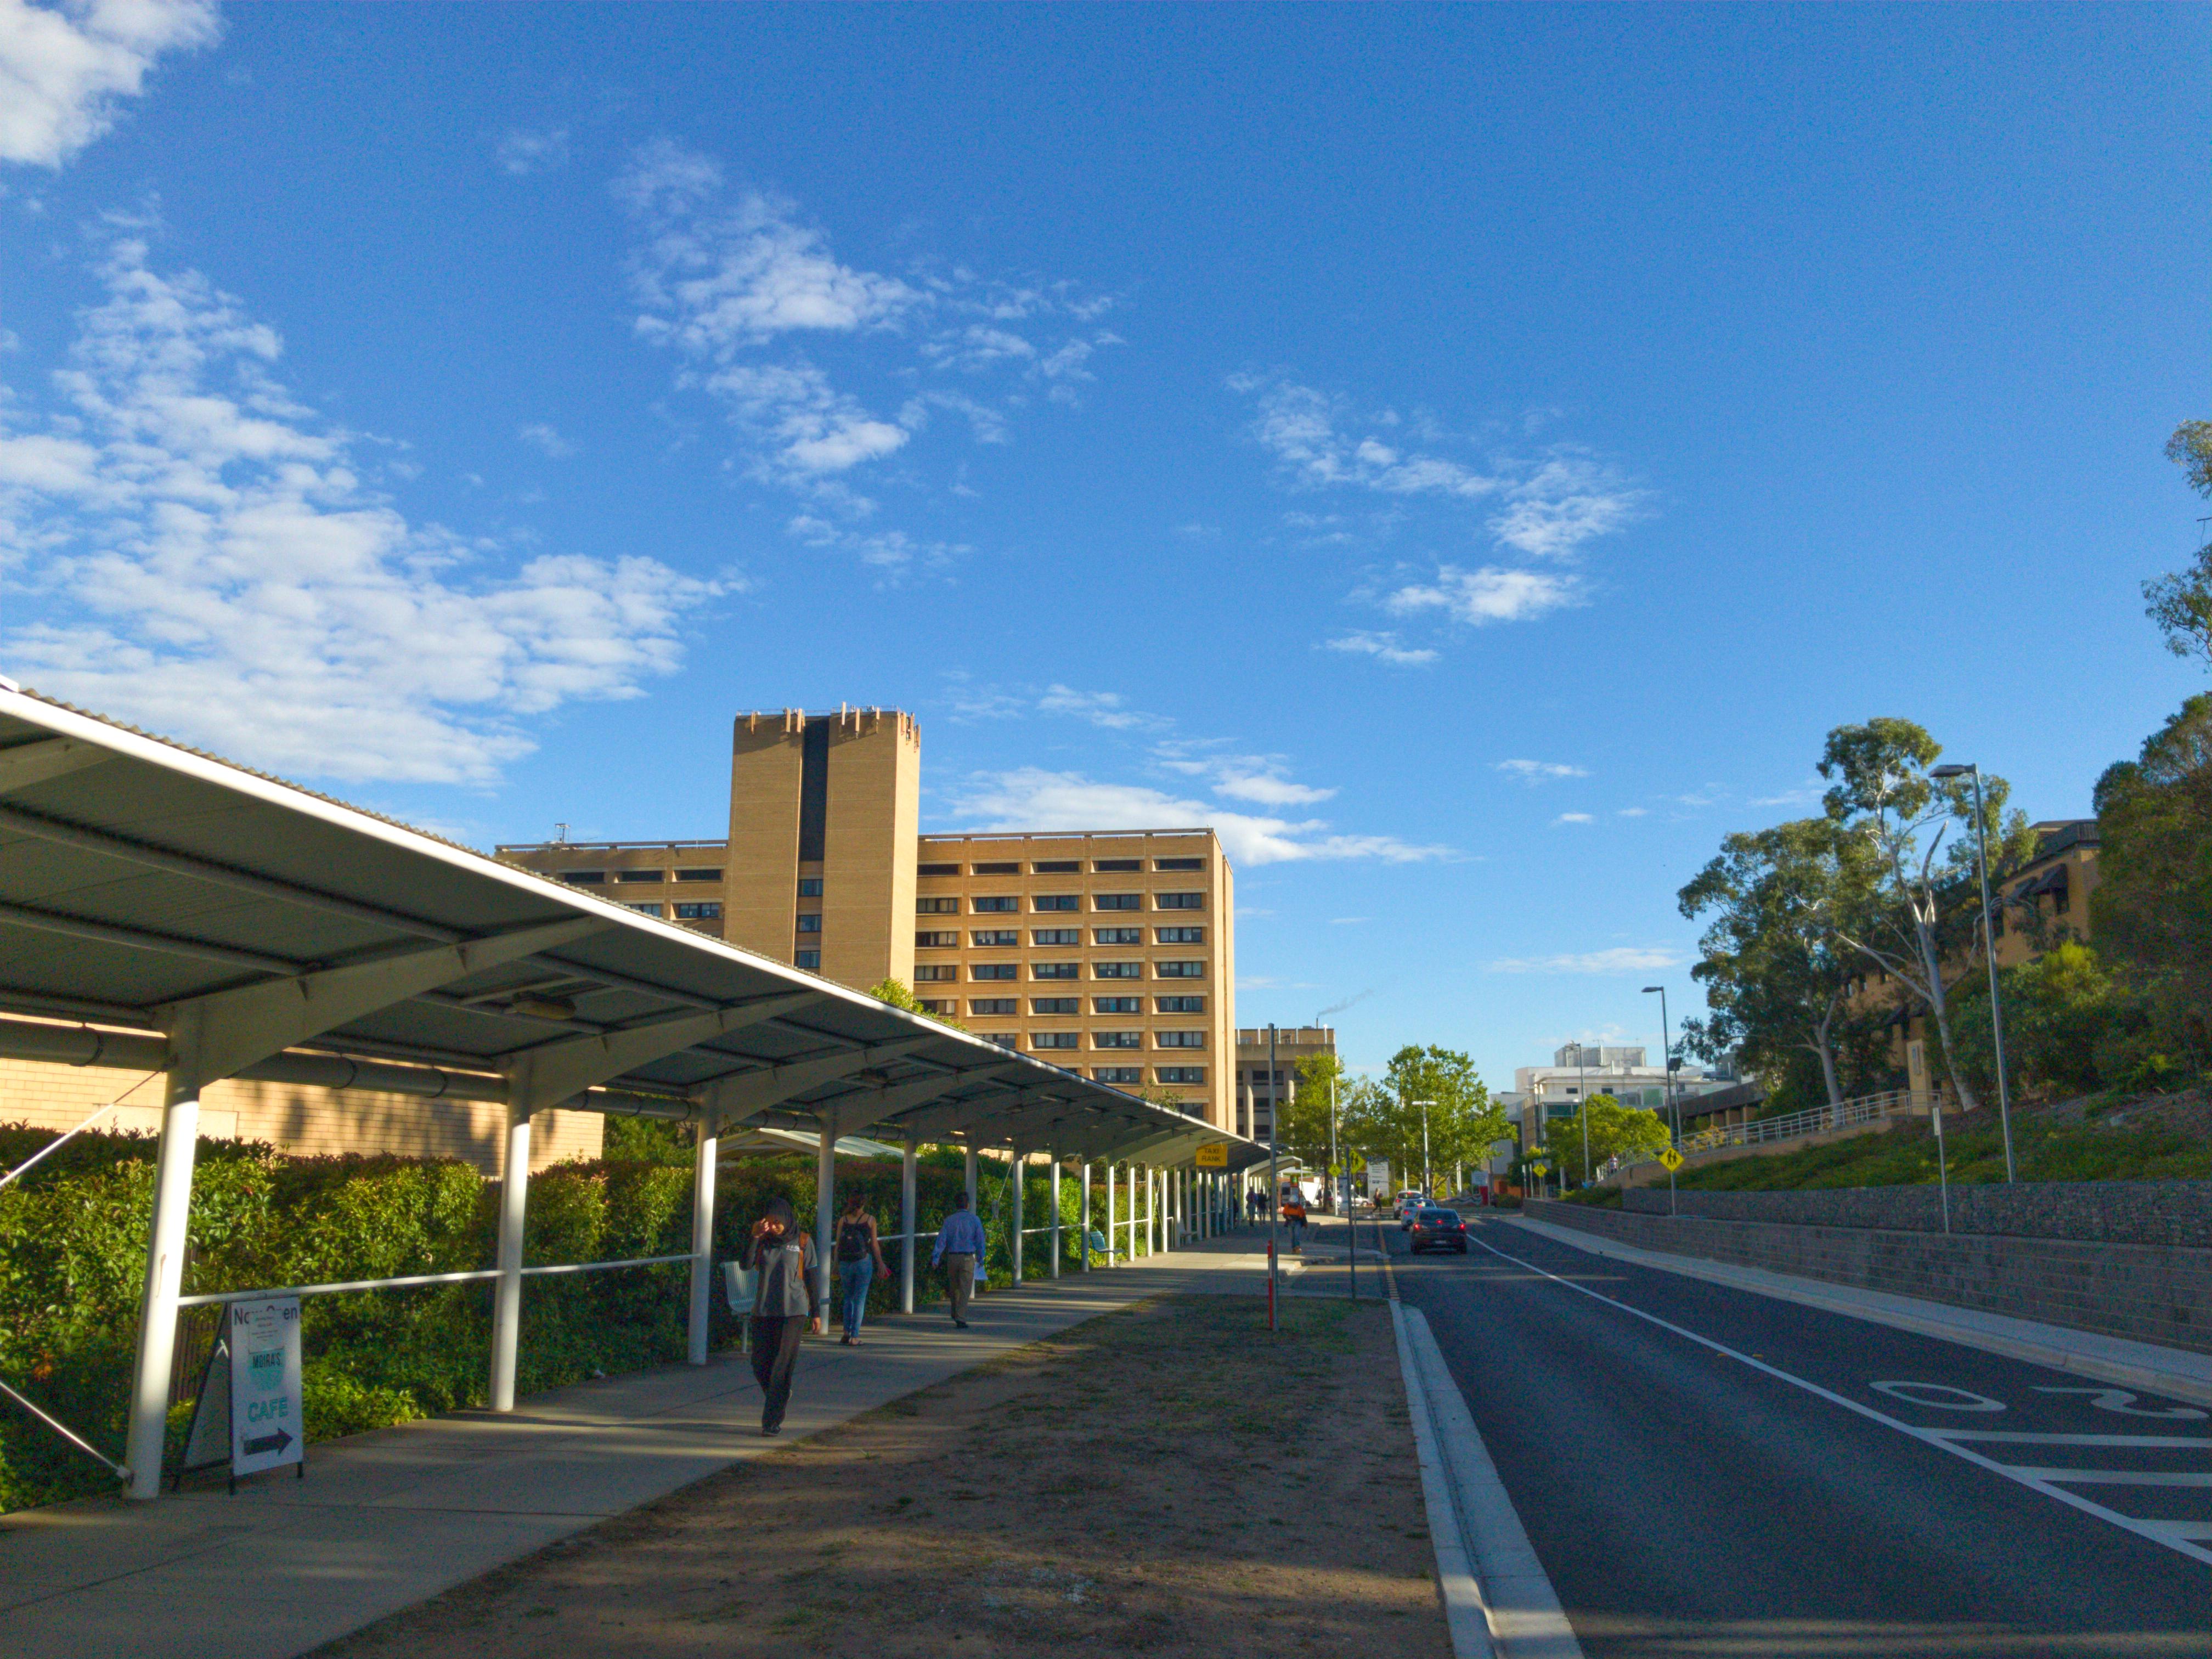 The Canberra Hospital Friday 2017-02-17 Gary Lum